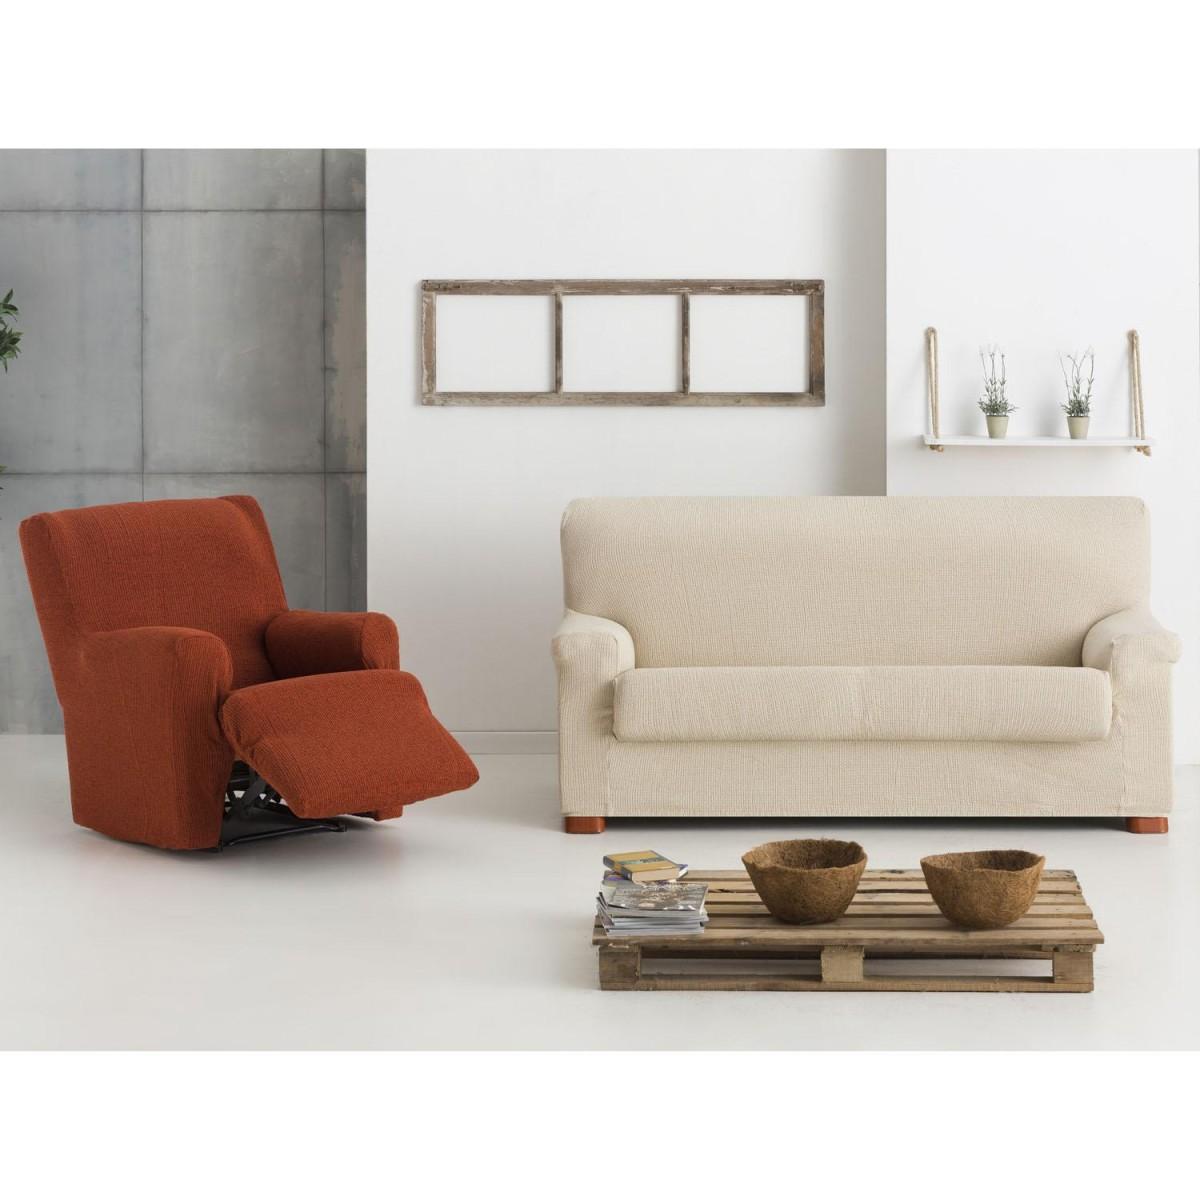 Funda sof duplex dorian eysa complementos - Fundas sofa madrid ...